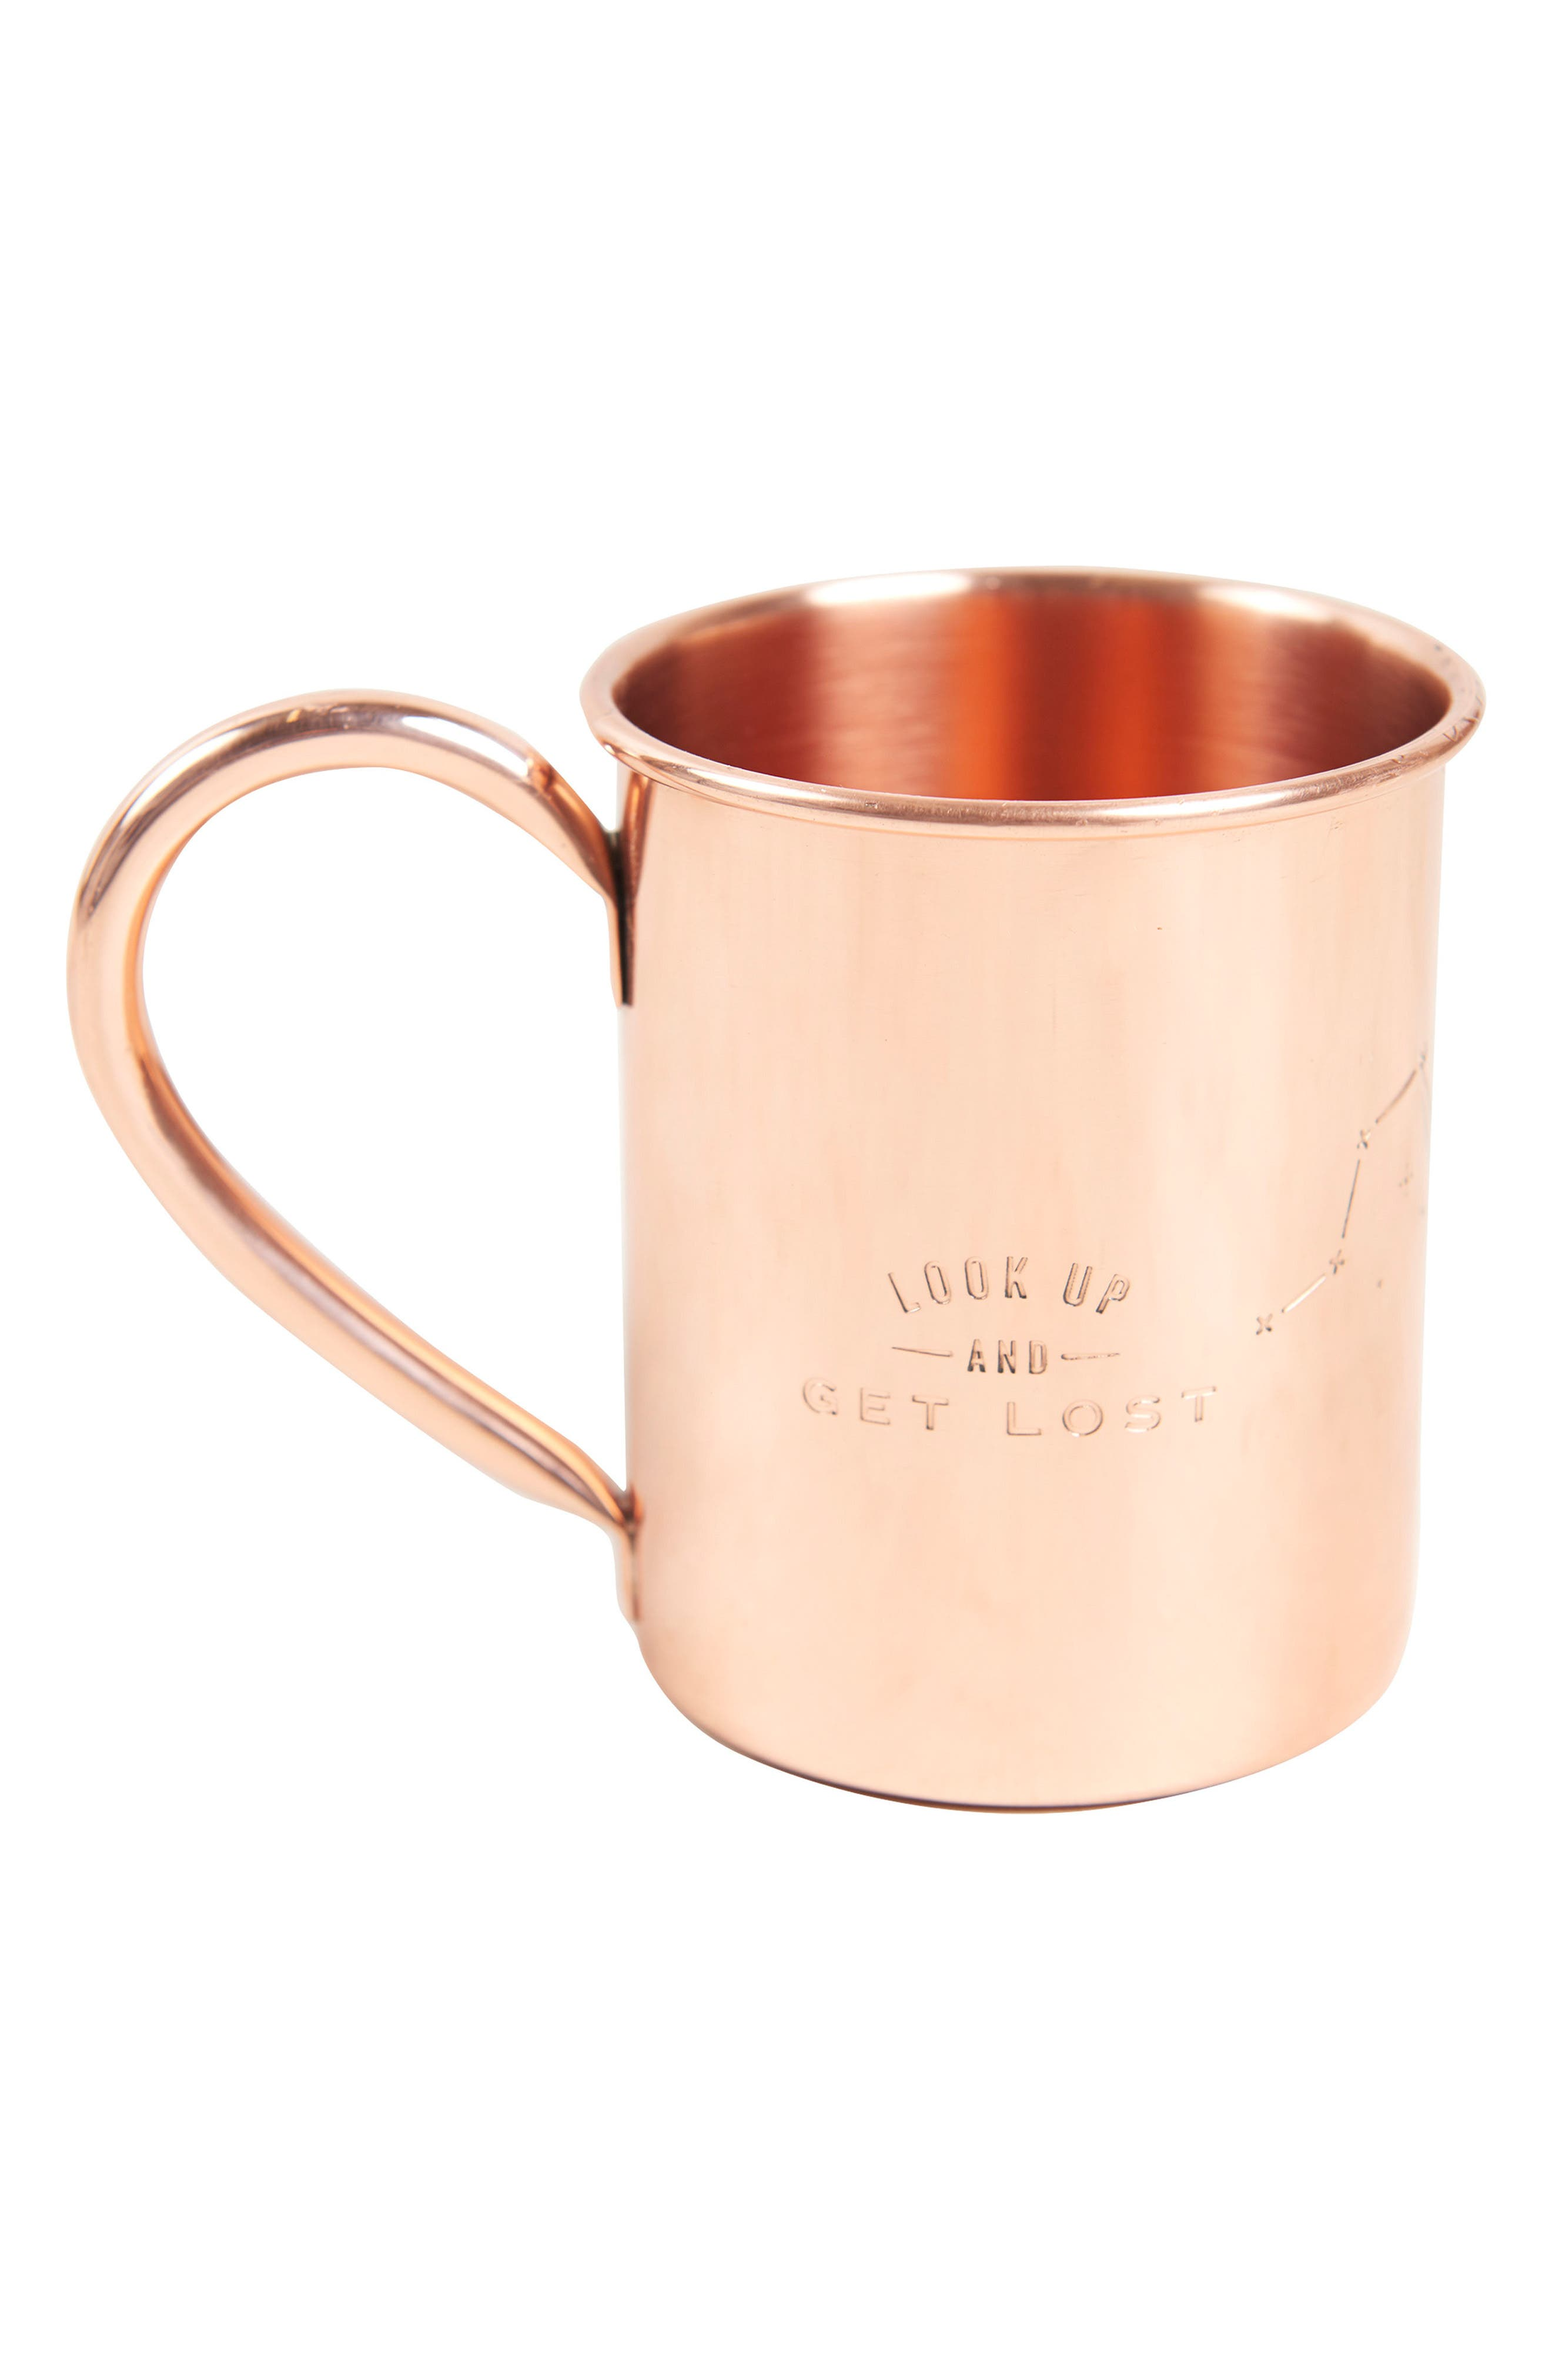 Engraved Copper Mug,                         Main,                         color, Look Up